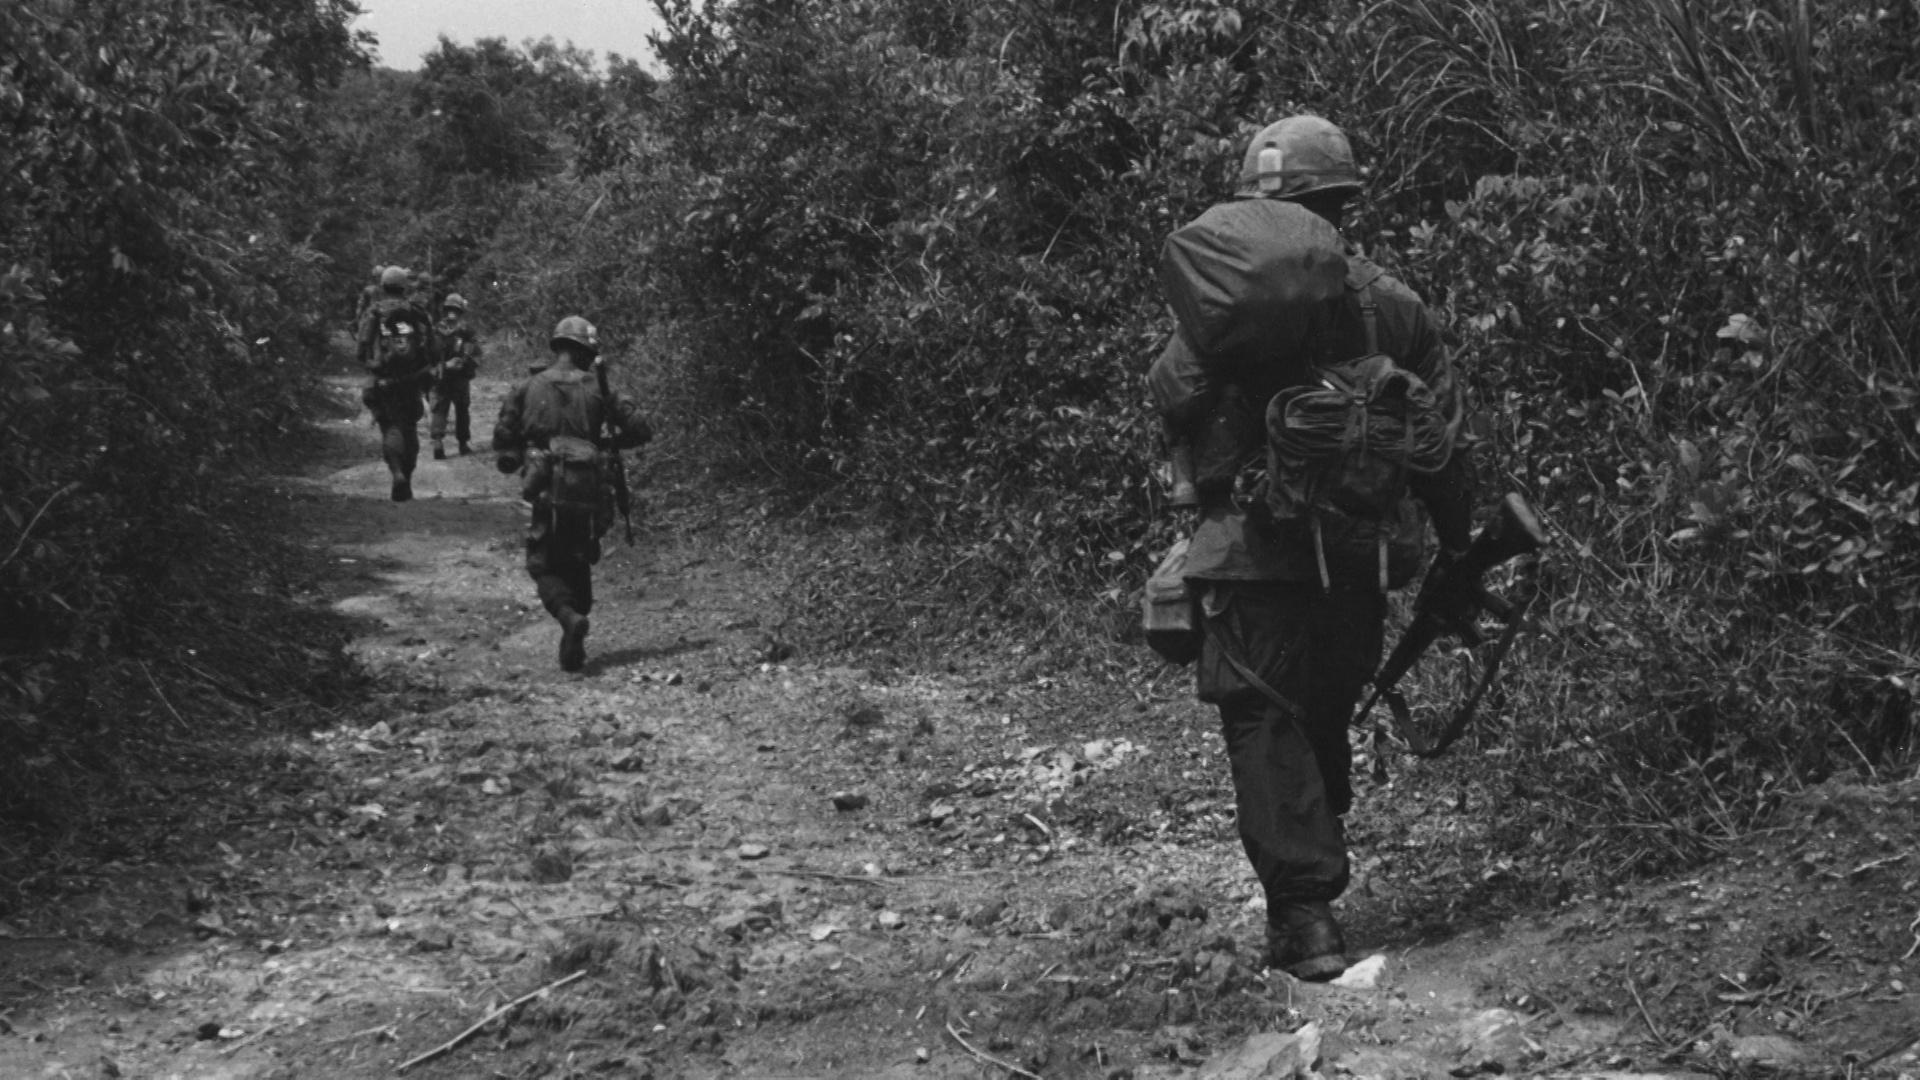 Remembering the Vietnam War